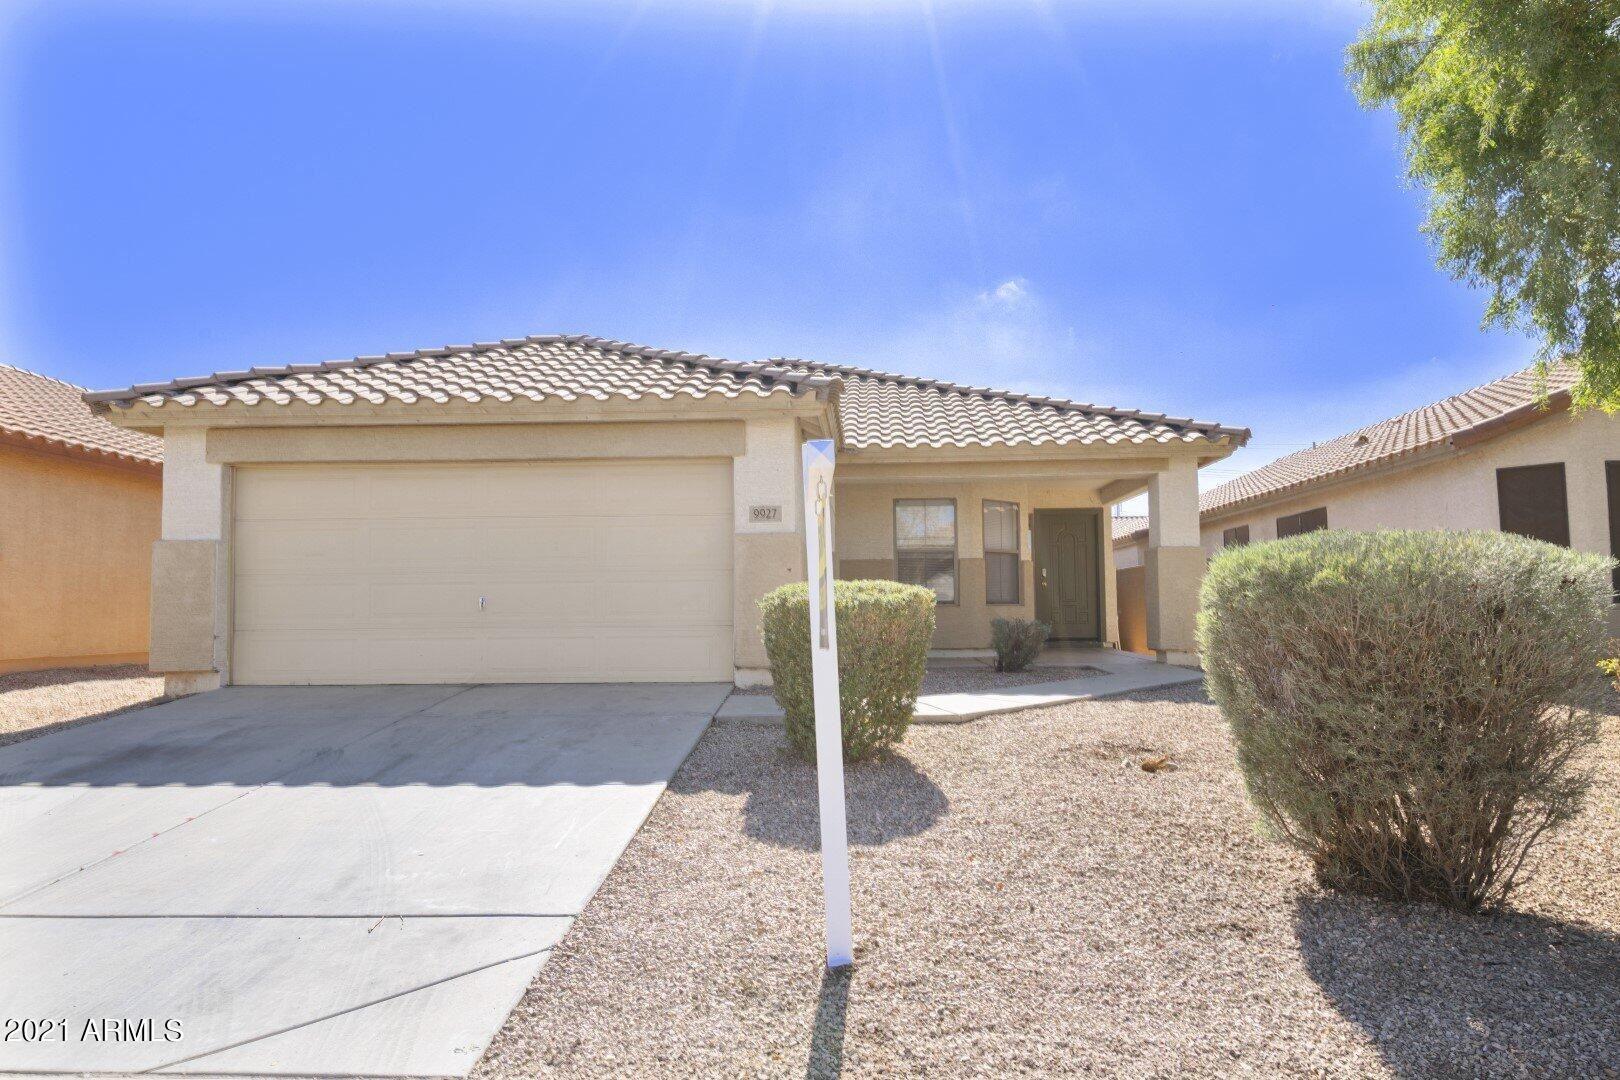 Photo of 9927 W SOUTHGATE Avenue, Tolleson, AZ 85353 (MLS # 6311150)